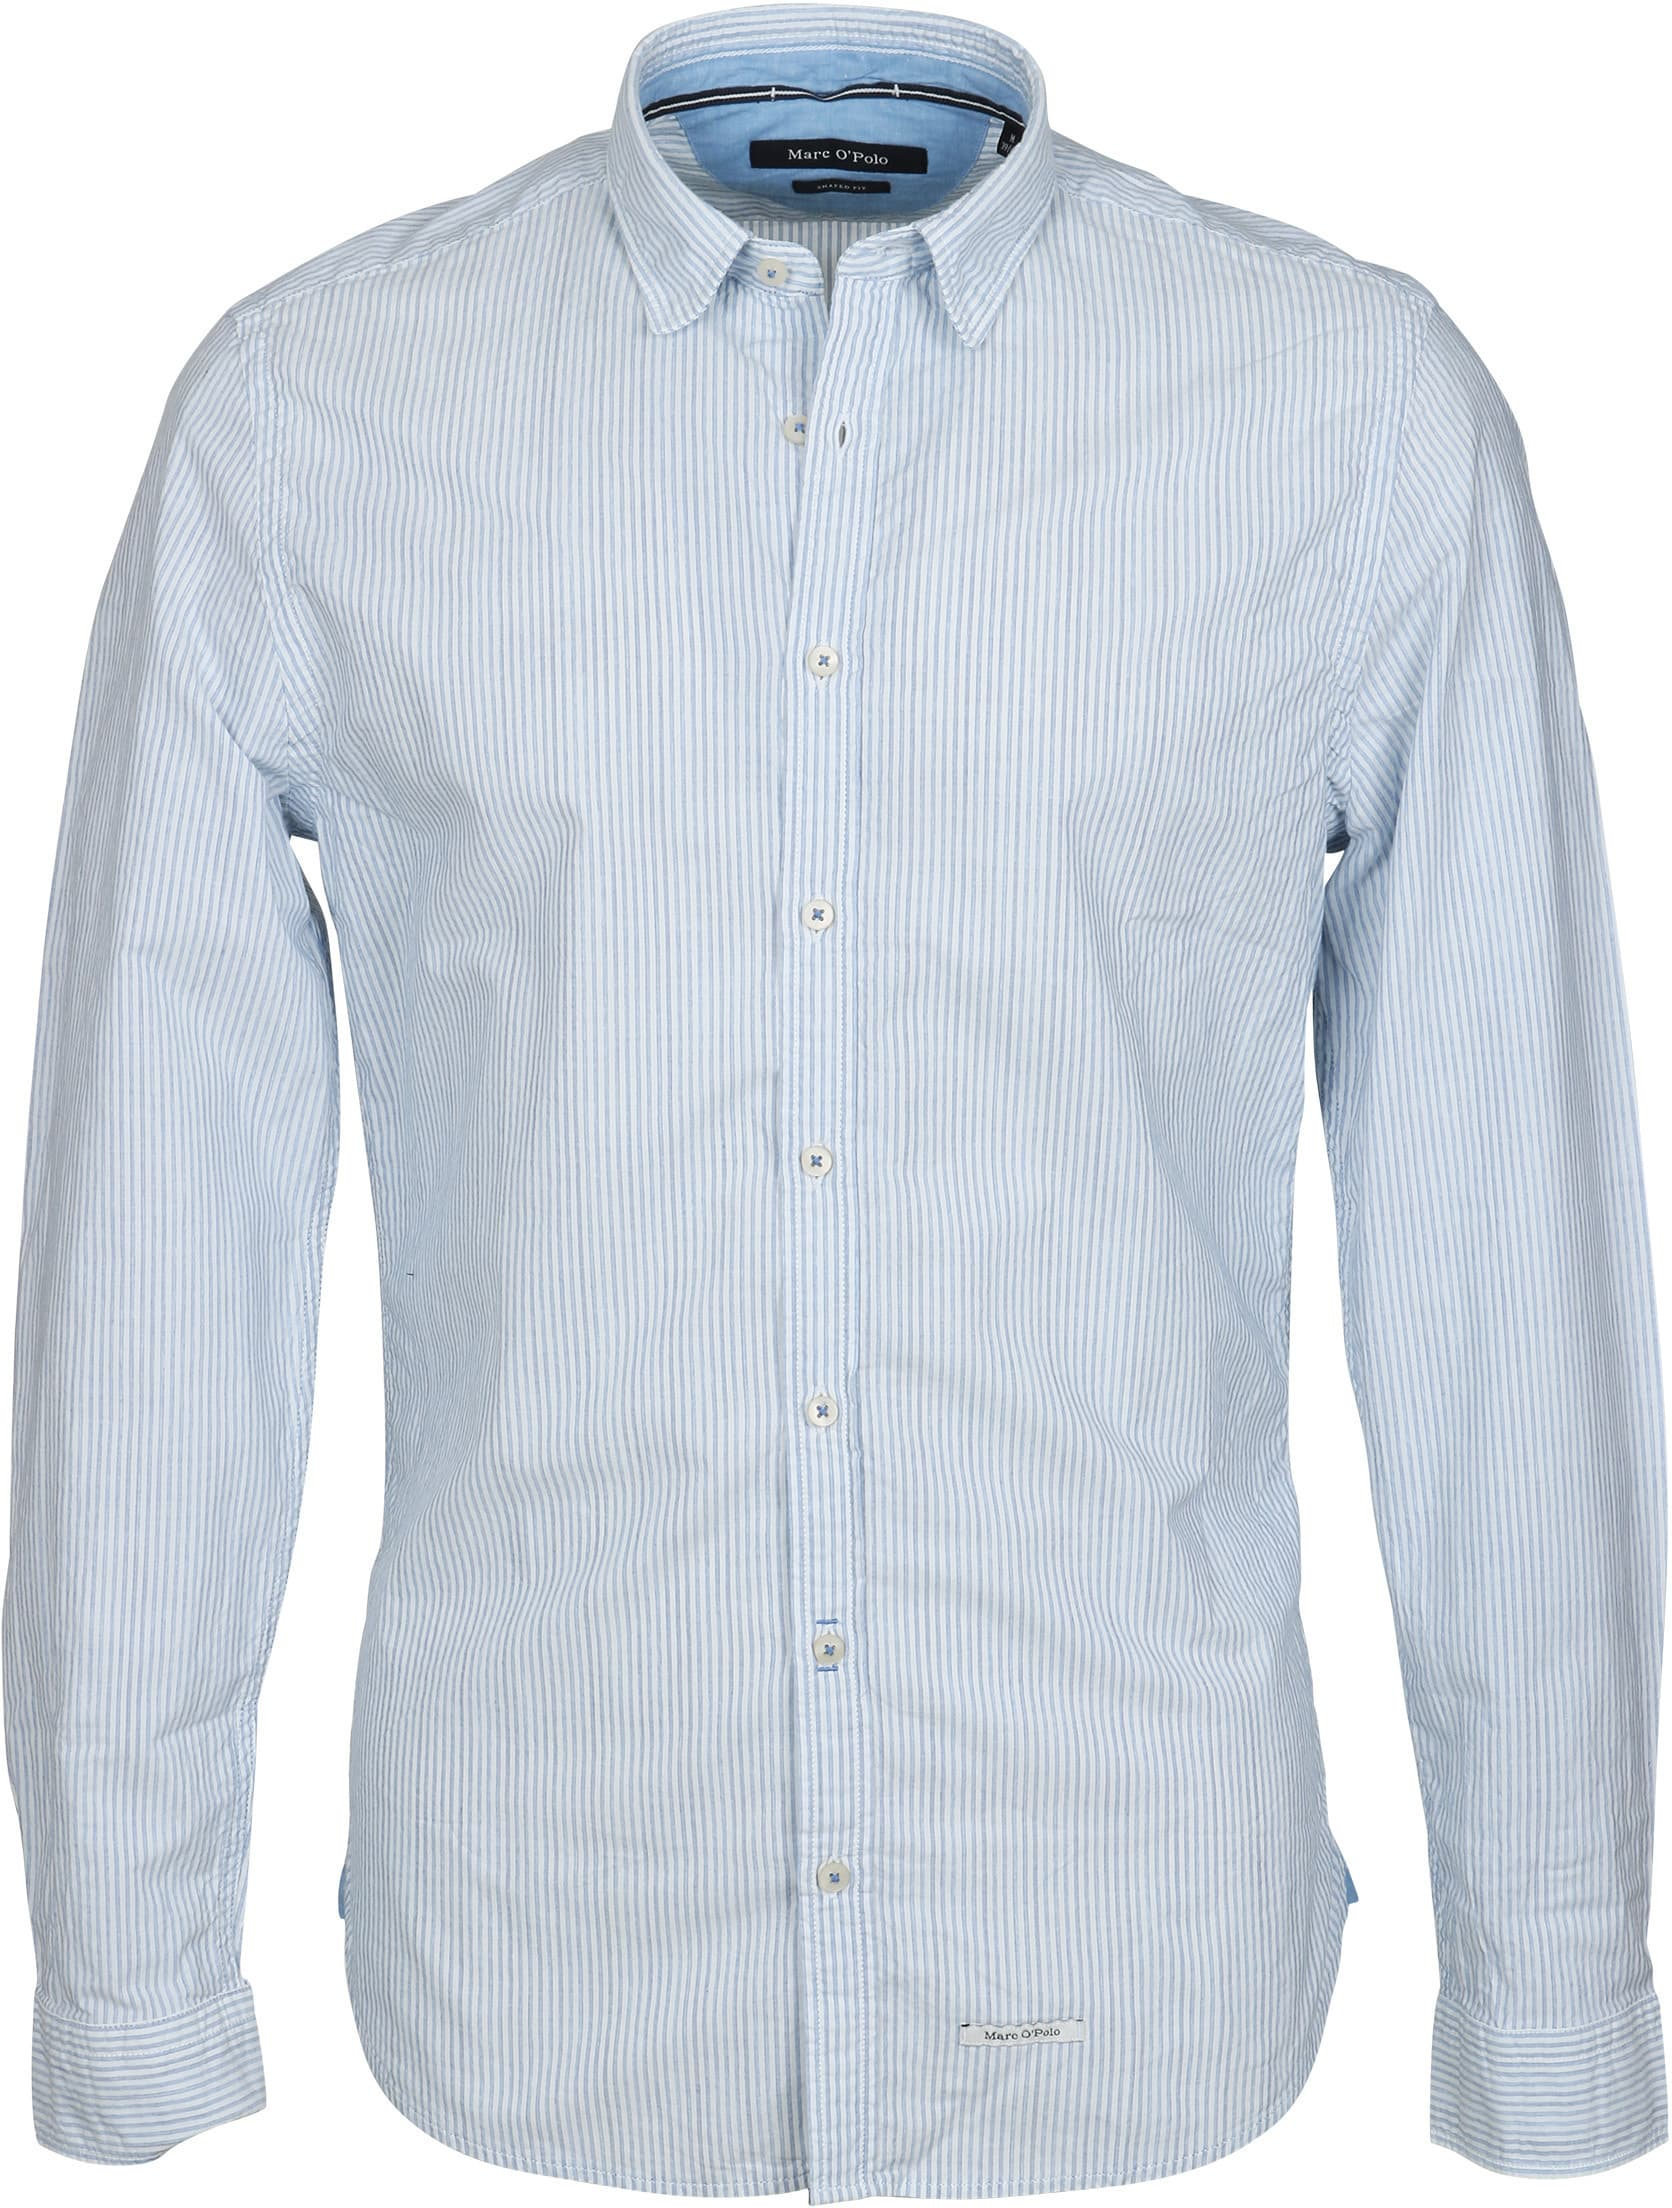 b6013145e710 Marc O Polo Shirt Stripes M22741542216 order online